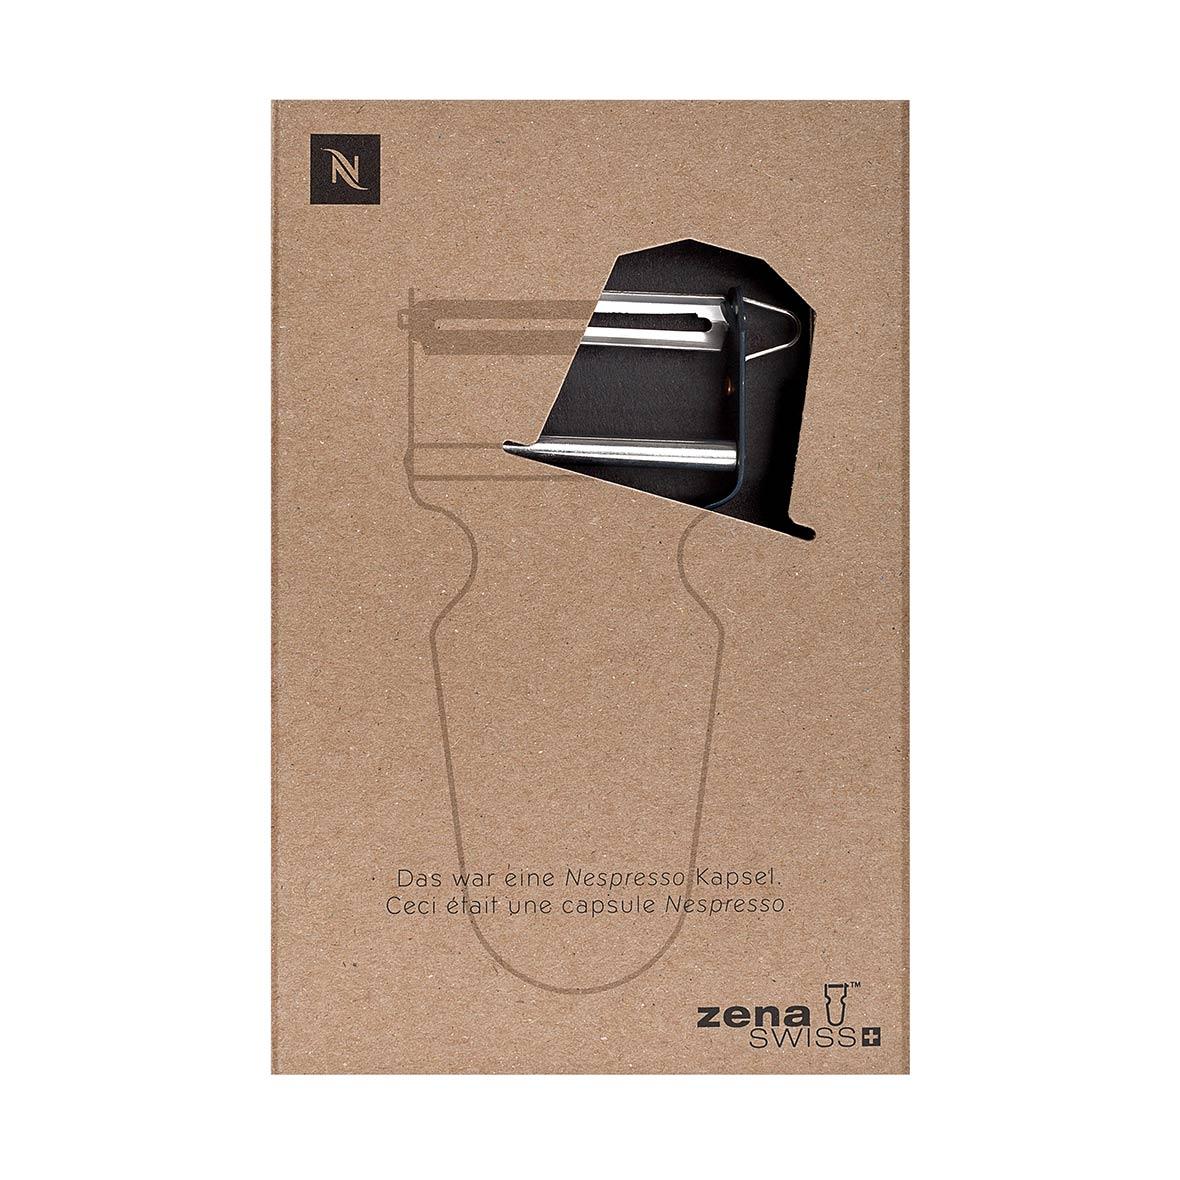 nespresso kapseln farben recaps stcke klebstoff aluminium. Black Bedroom Furniture Sets. Home Design Ideas